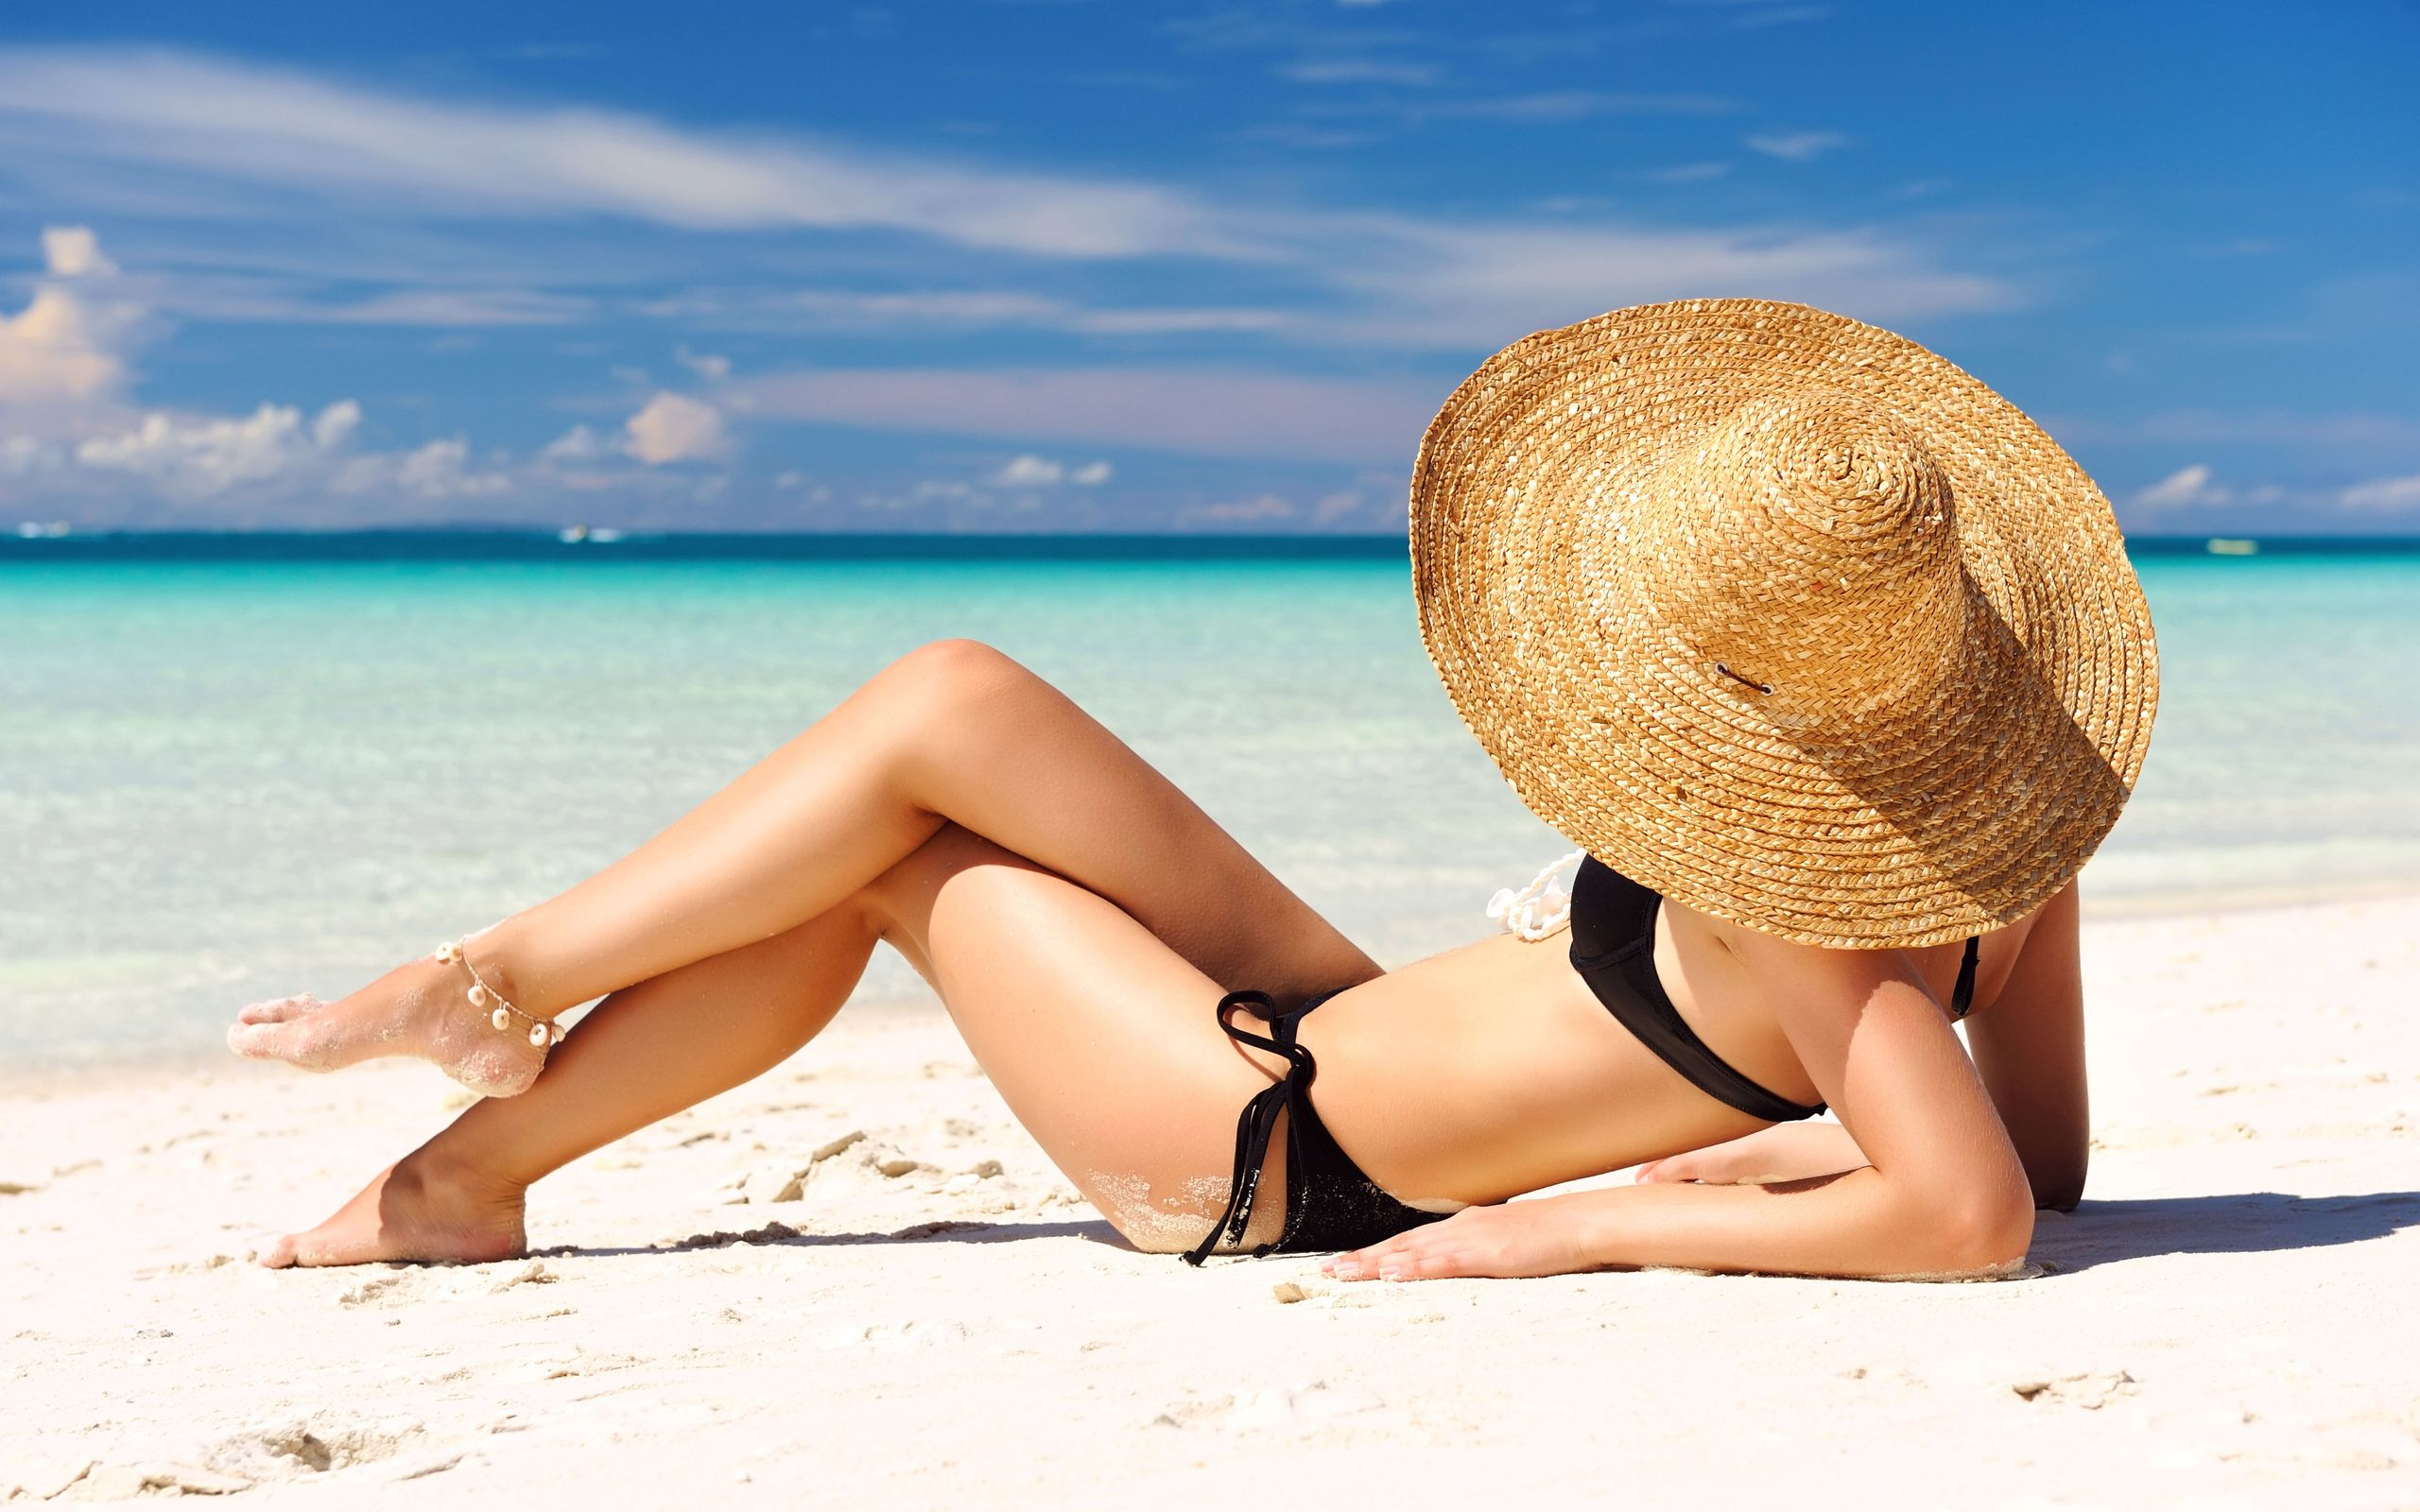 bikini full hd wallpaper and background image   2560x1600   id:154809